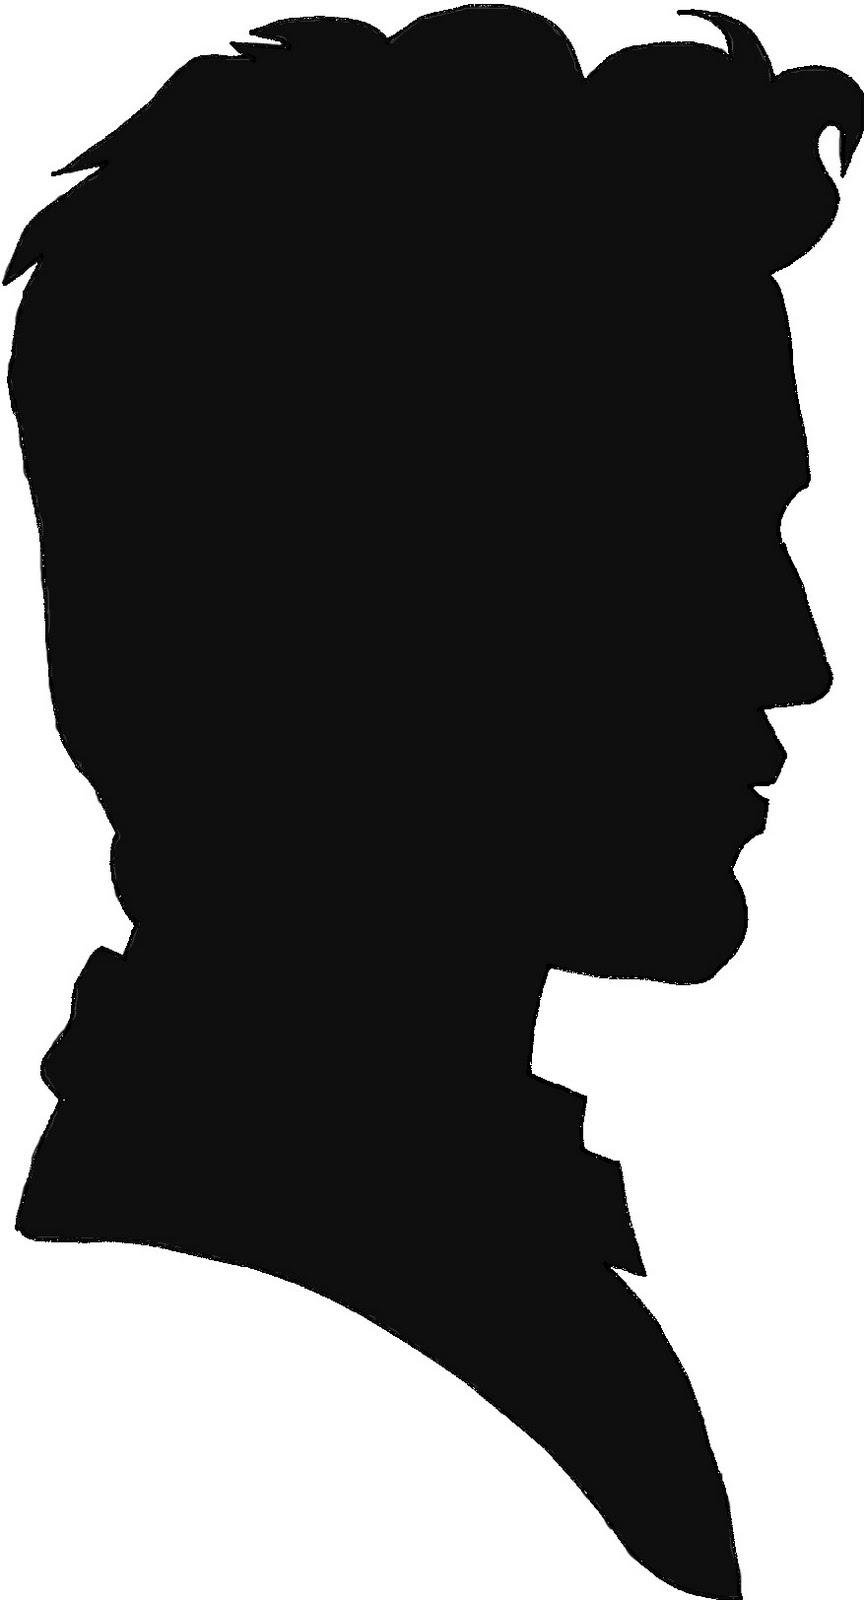 Free Silhouette Man Head, Download Free Clip Art, Free Clip.